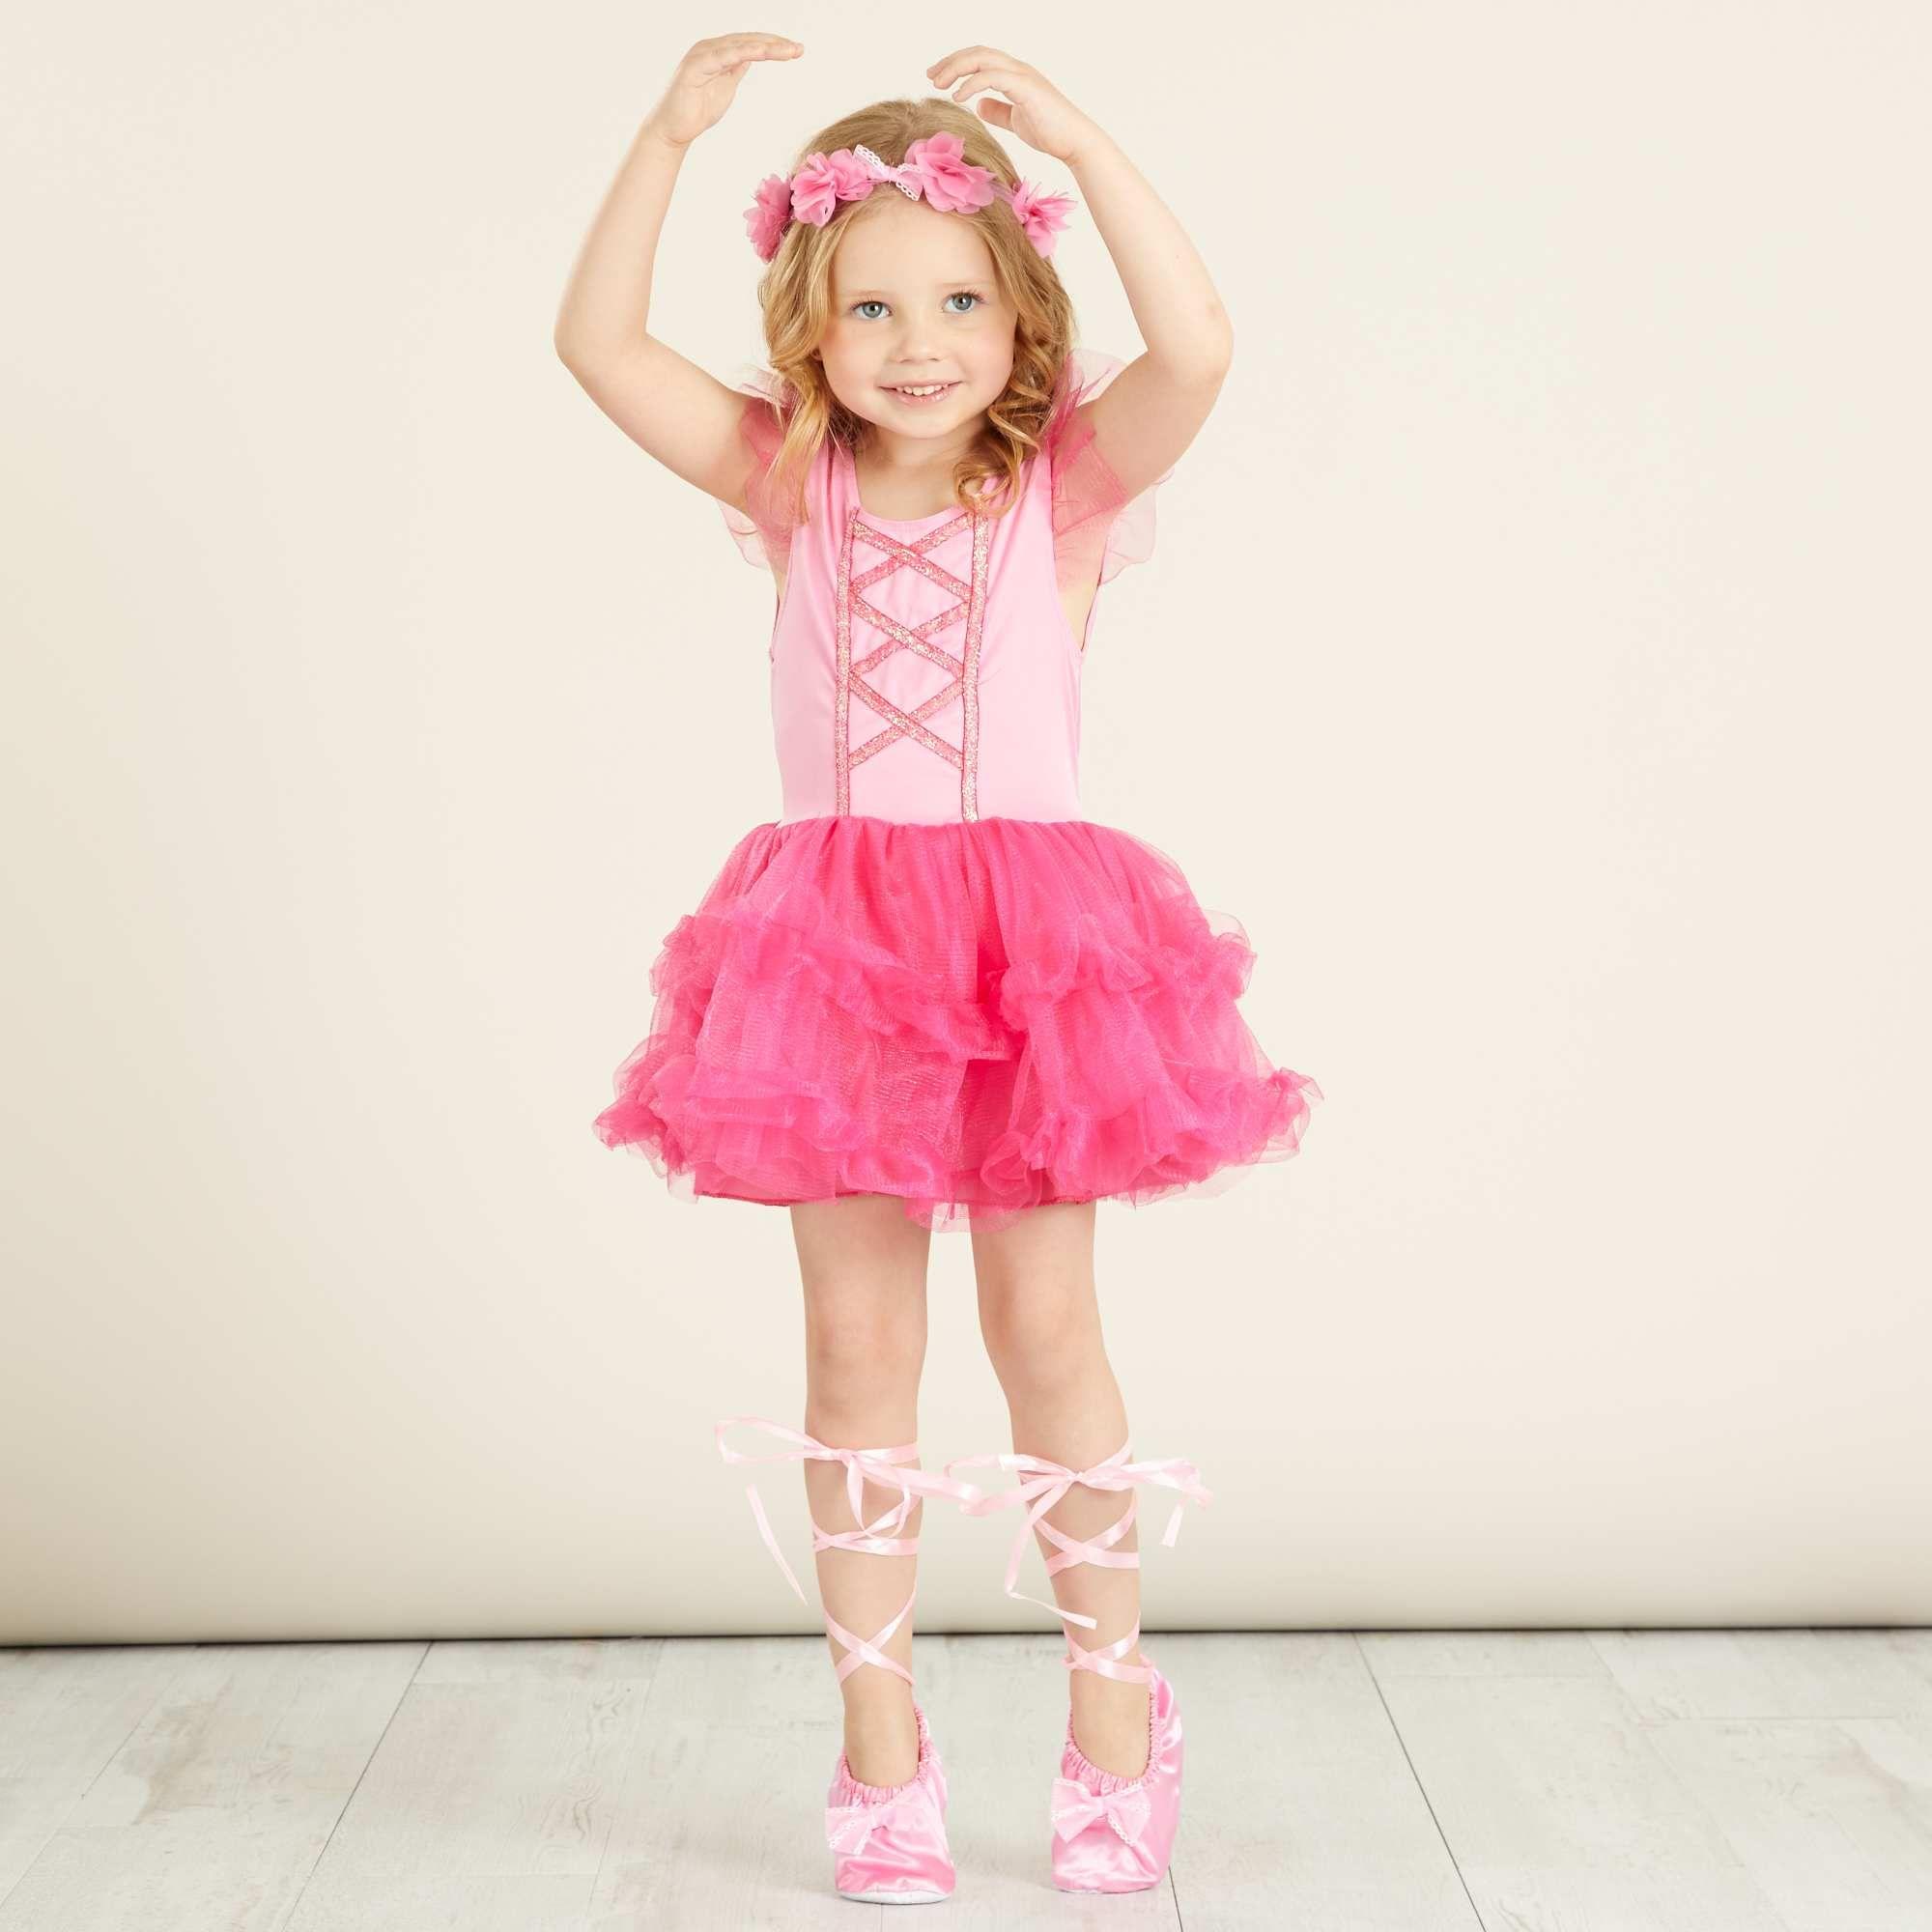 Costume ballerina Bambini - rosa - Kiabi - 11 618bbdb77b1